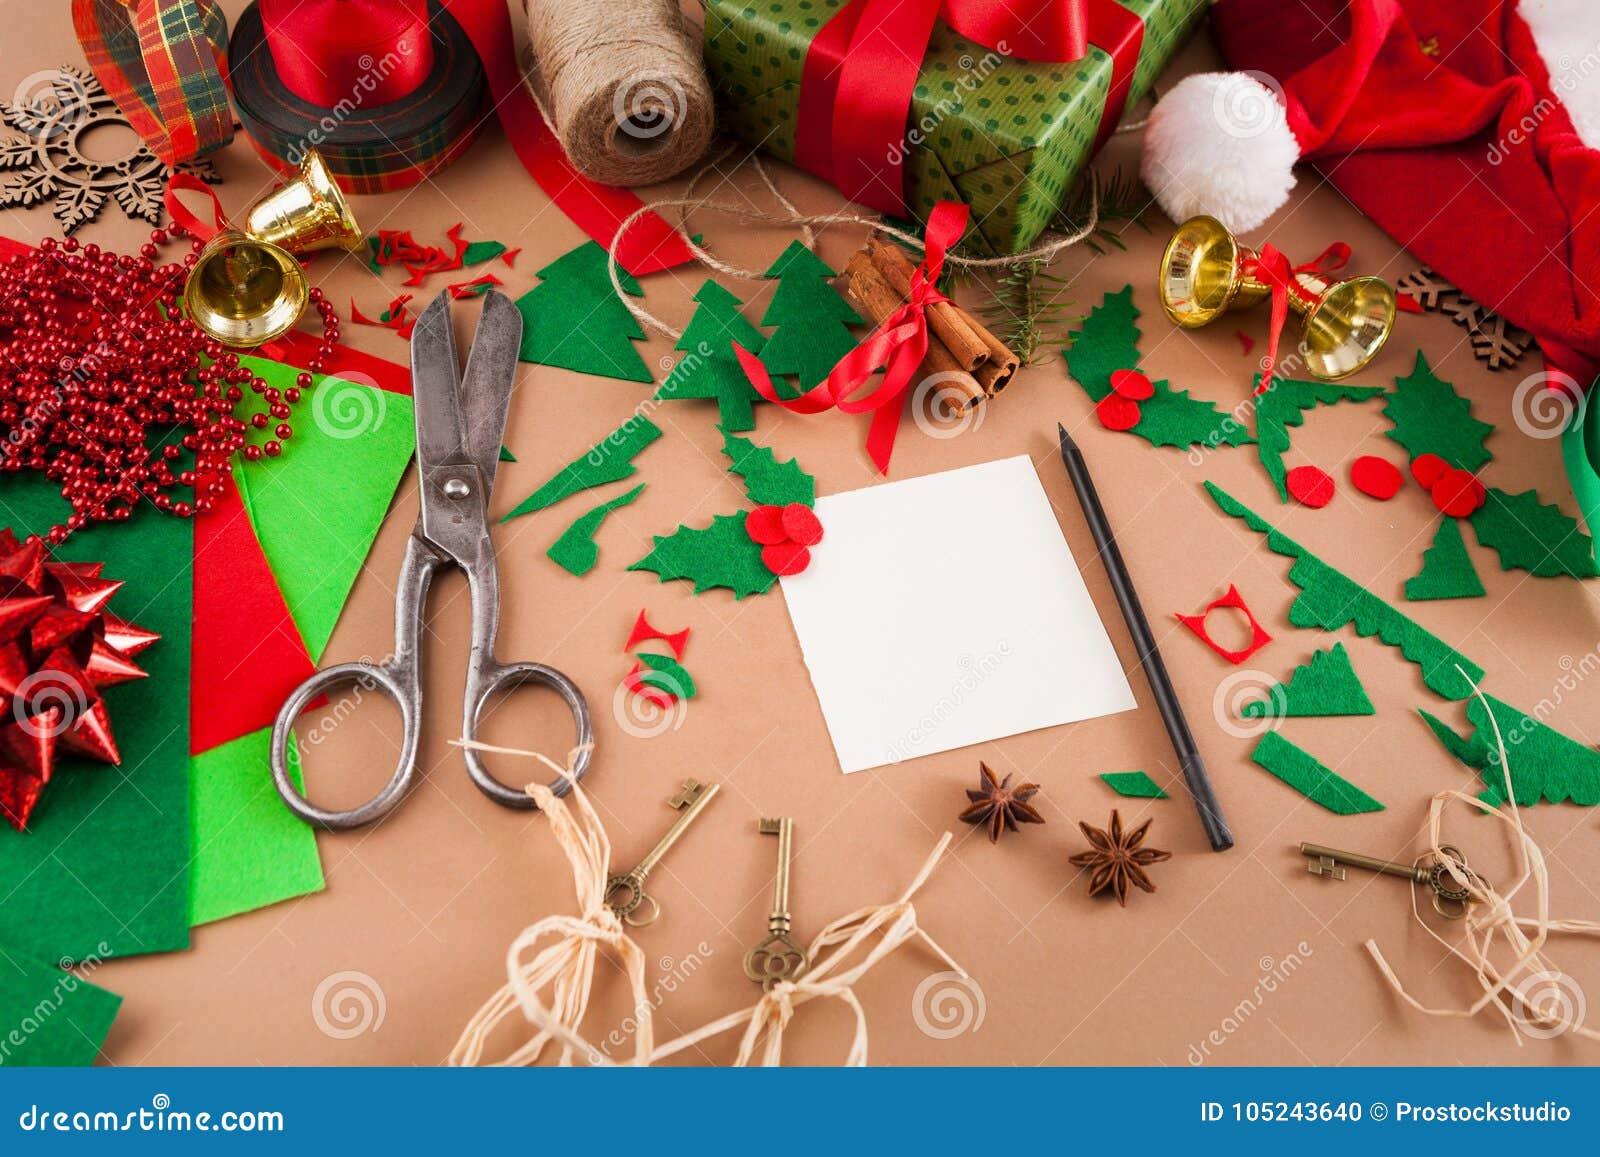 Creative Diy Hobby Christmas Decoration Of Handmade Greetings Card